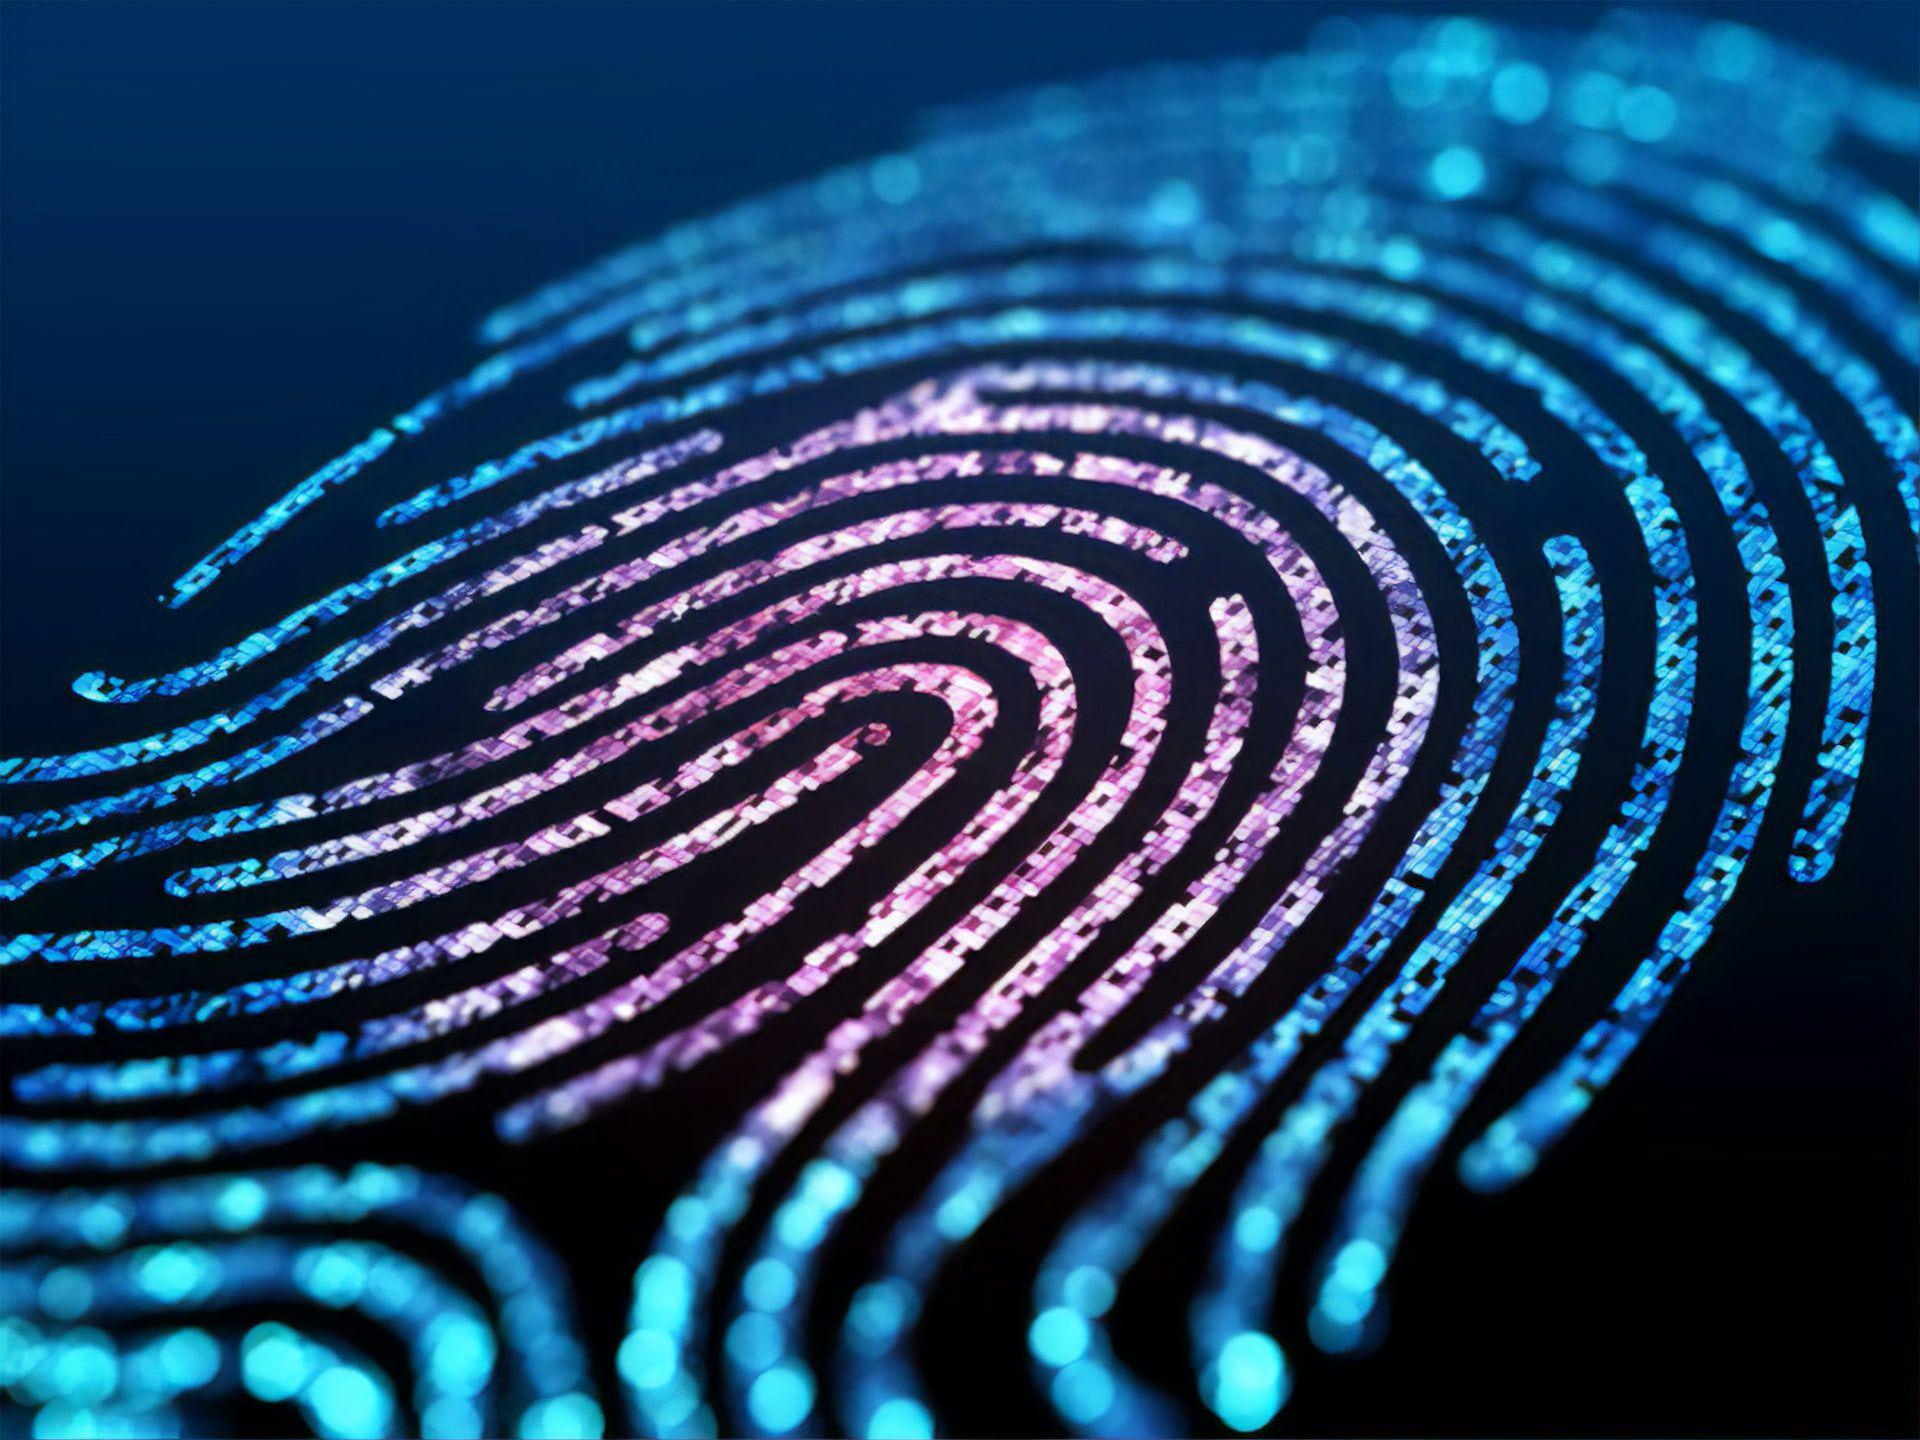 /data-fingerprinting-in-javascript-k0c23ygz feature image